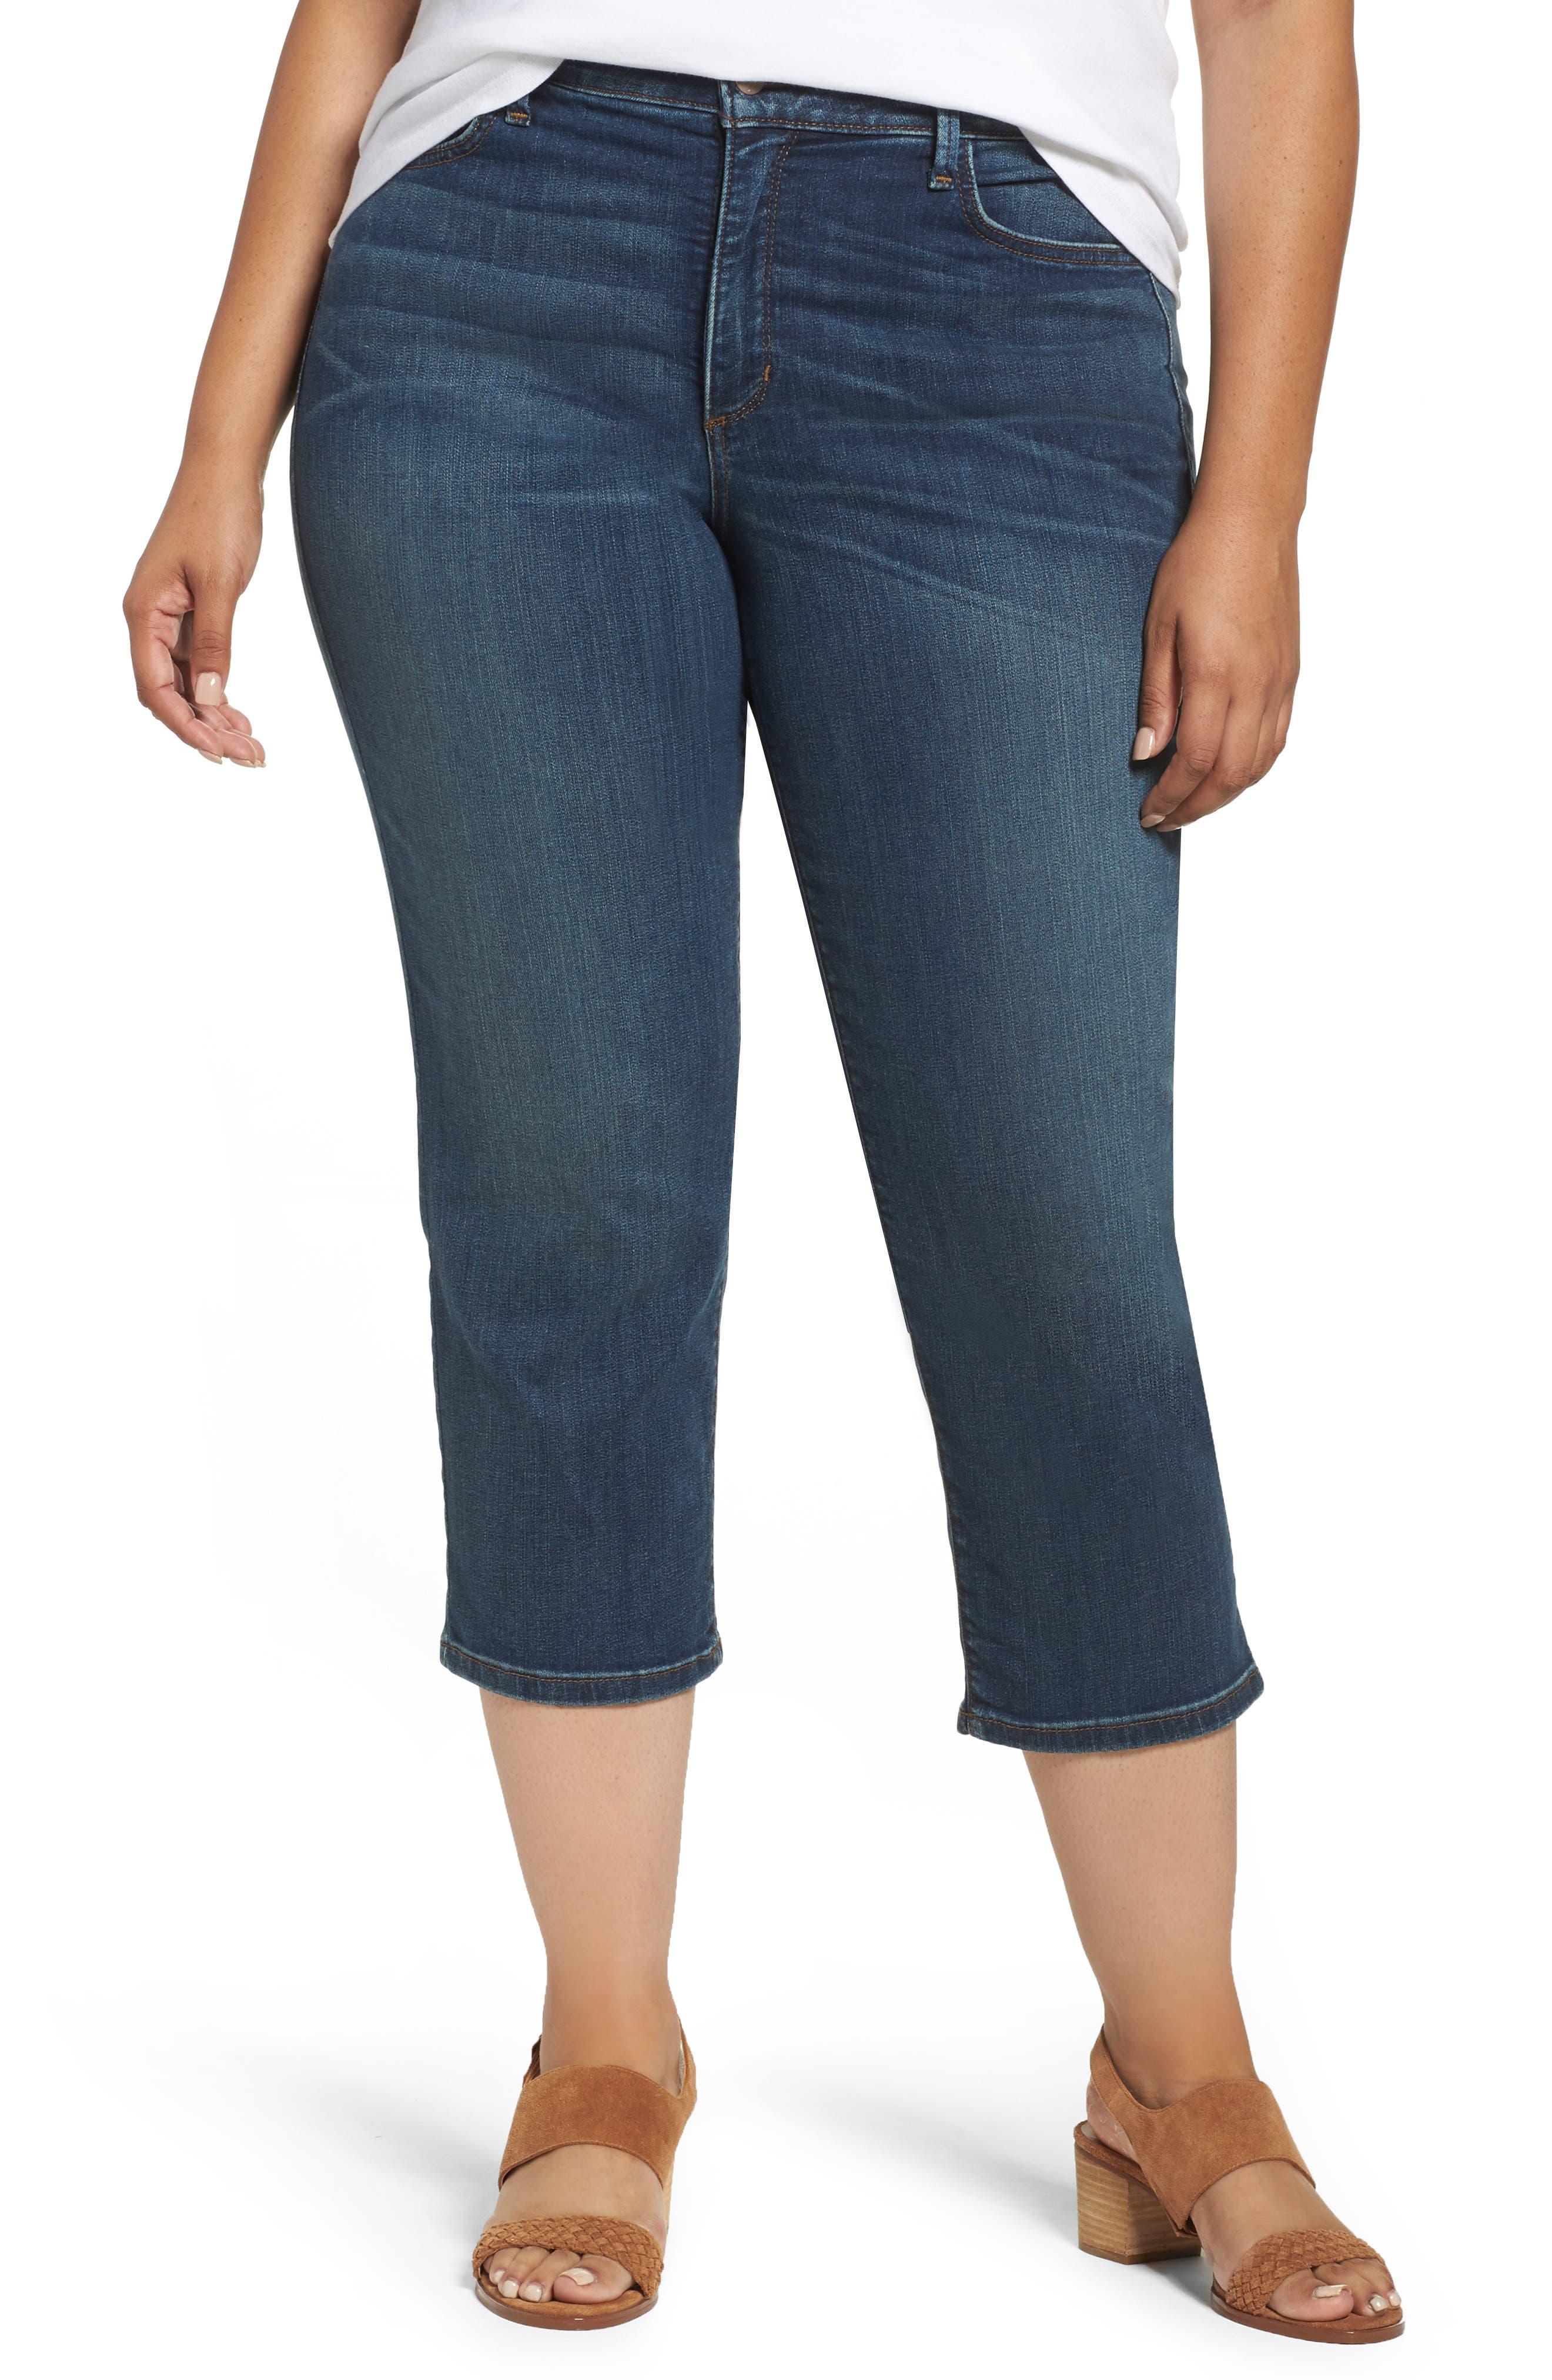 NYDJ Marilyn Stretch Capri Jeans (Oak Hill) (Plus Size)